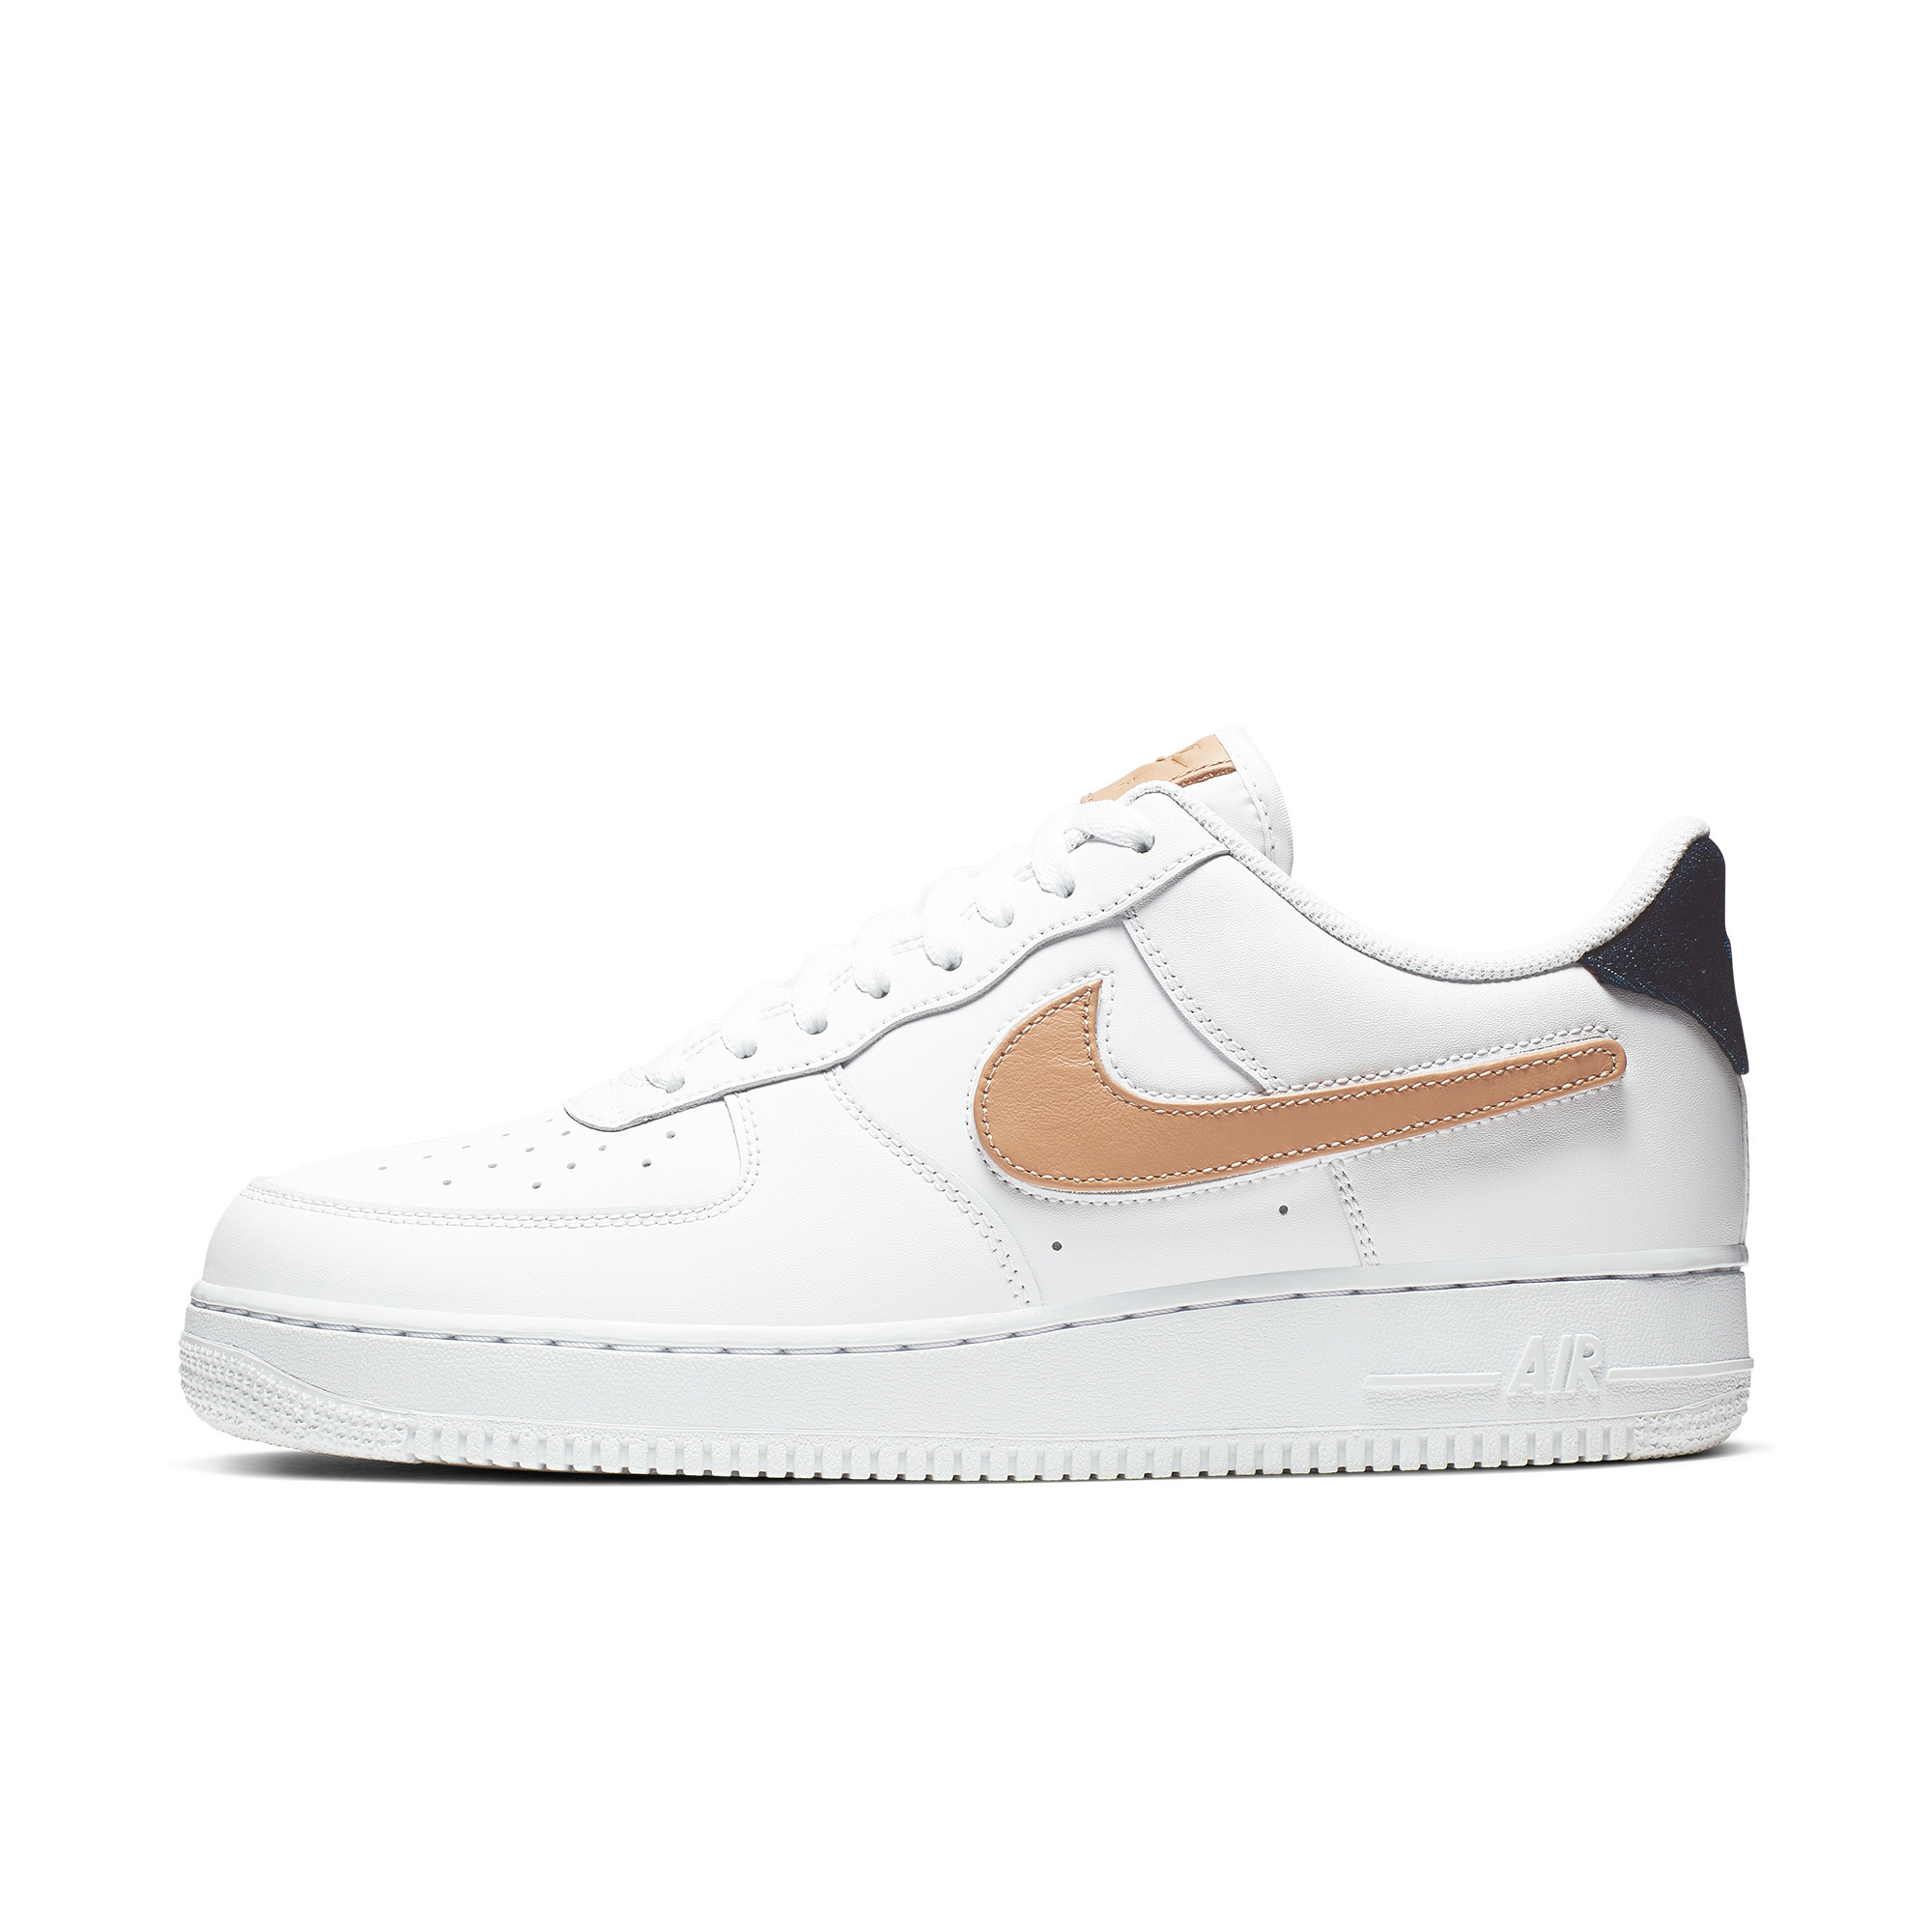 Nike Air Force 1 07 LV8 3 ( BQ4329 001 ) OVERKILL Berlin